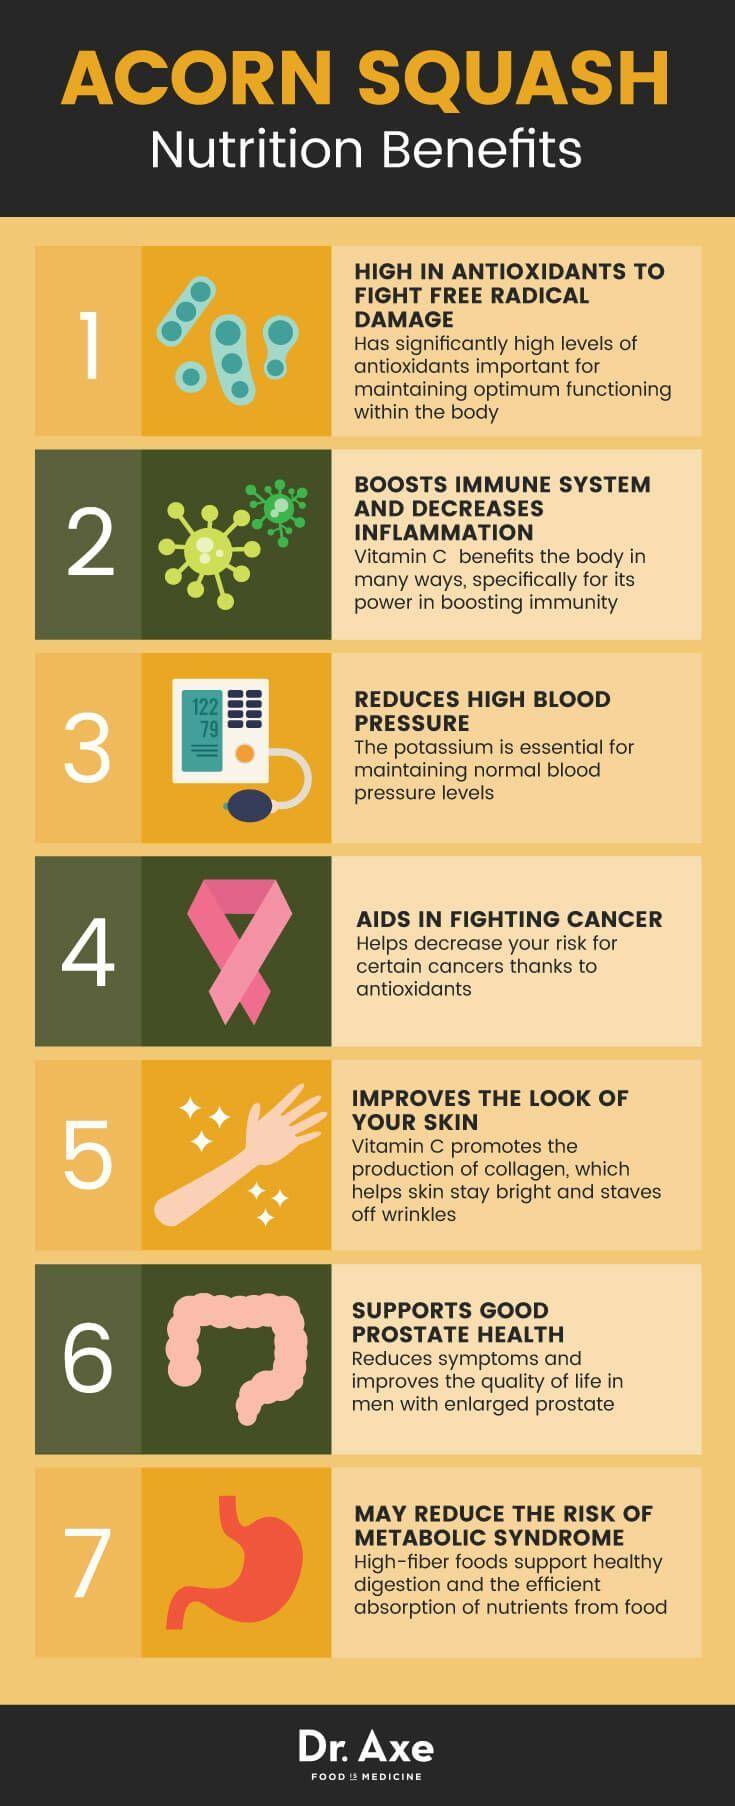 Acorn squash nutrition benefits - Dr. Axe http://www.draxe.com #health #holistic #natural: